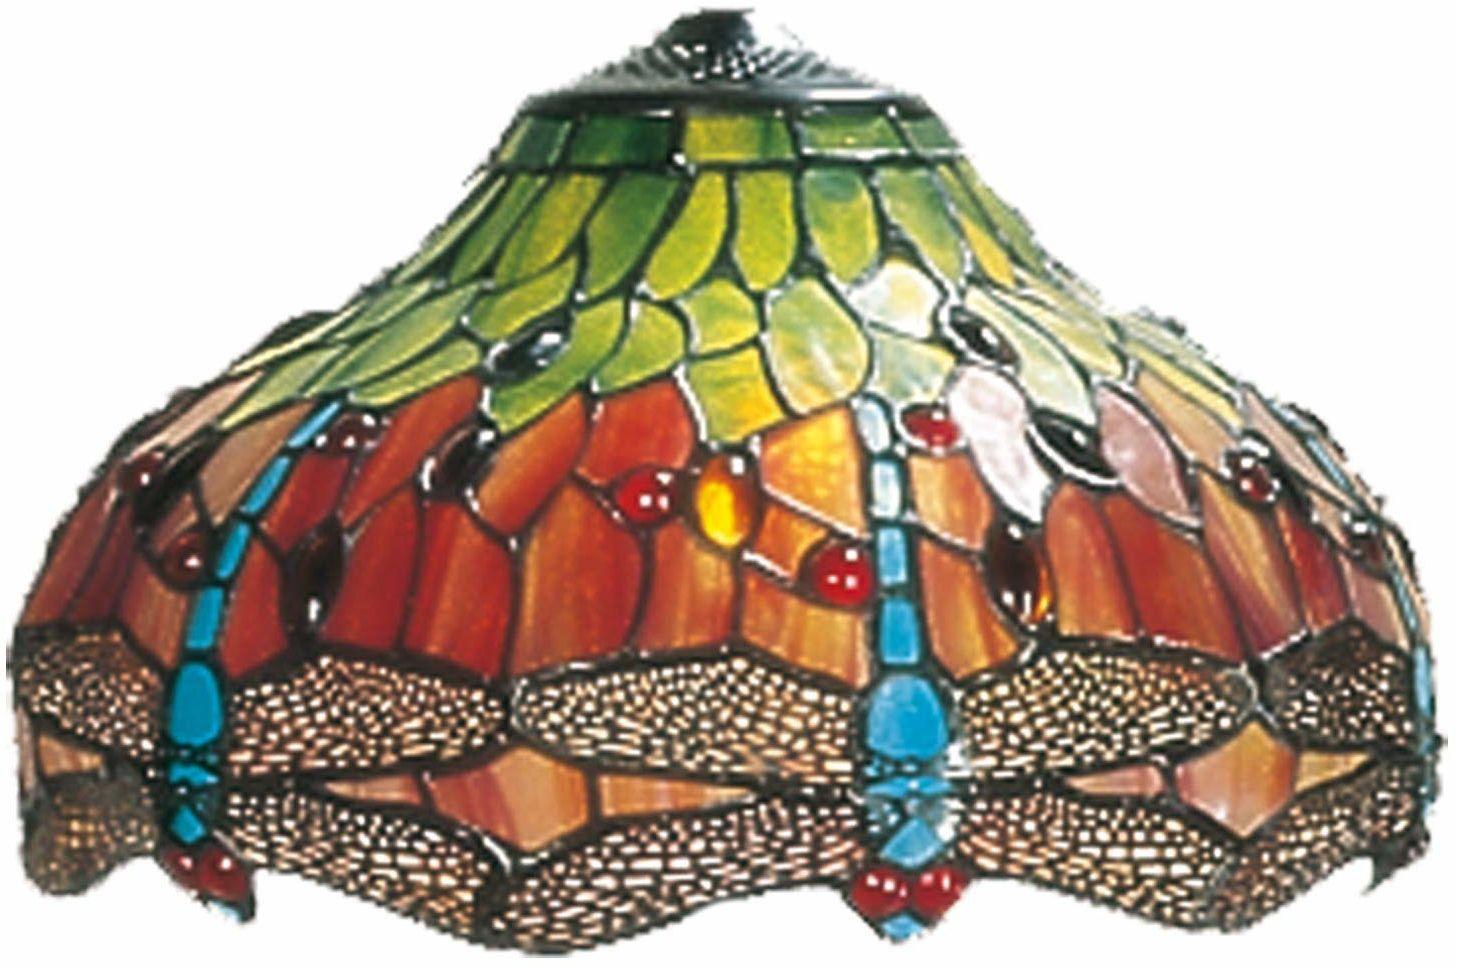 LumiLamp 5LL-9202 Tiffany szklany klosz lampy ok. Ø 30 cm dekoracyjne szkło ręczne szkło szklany klosz